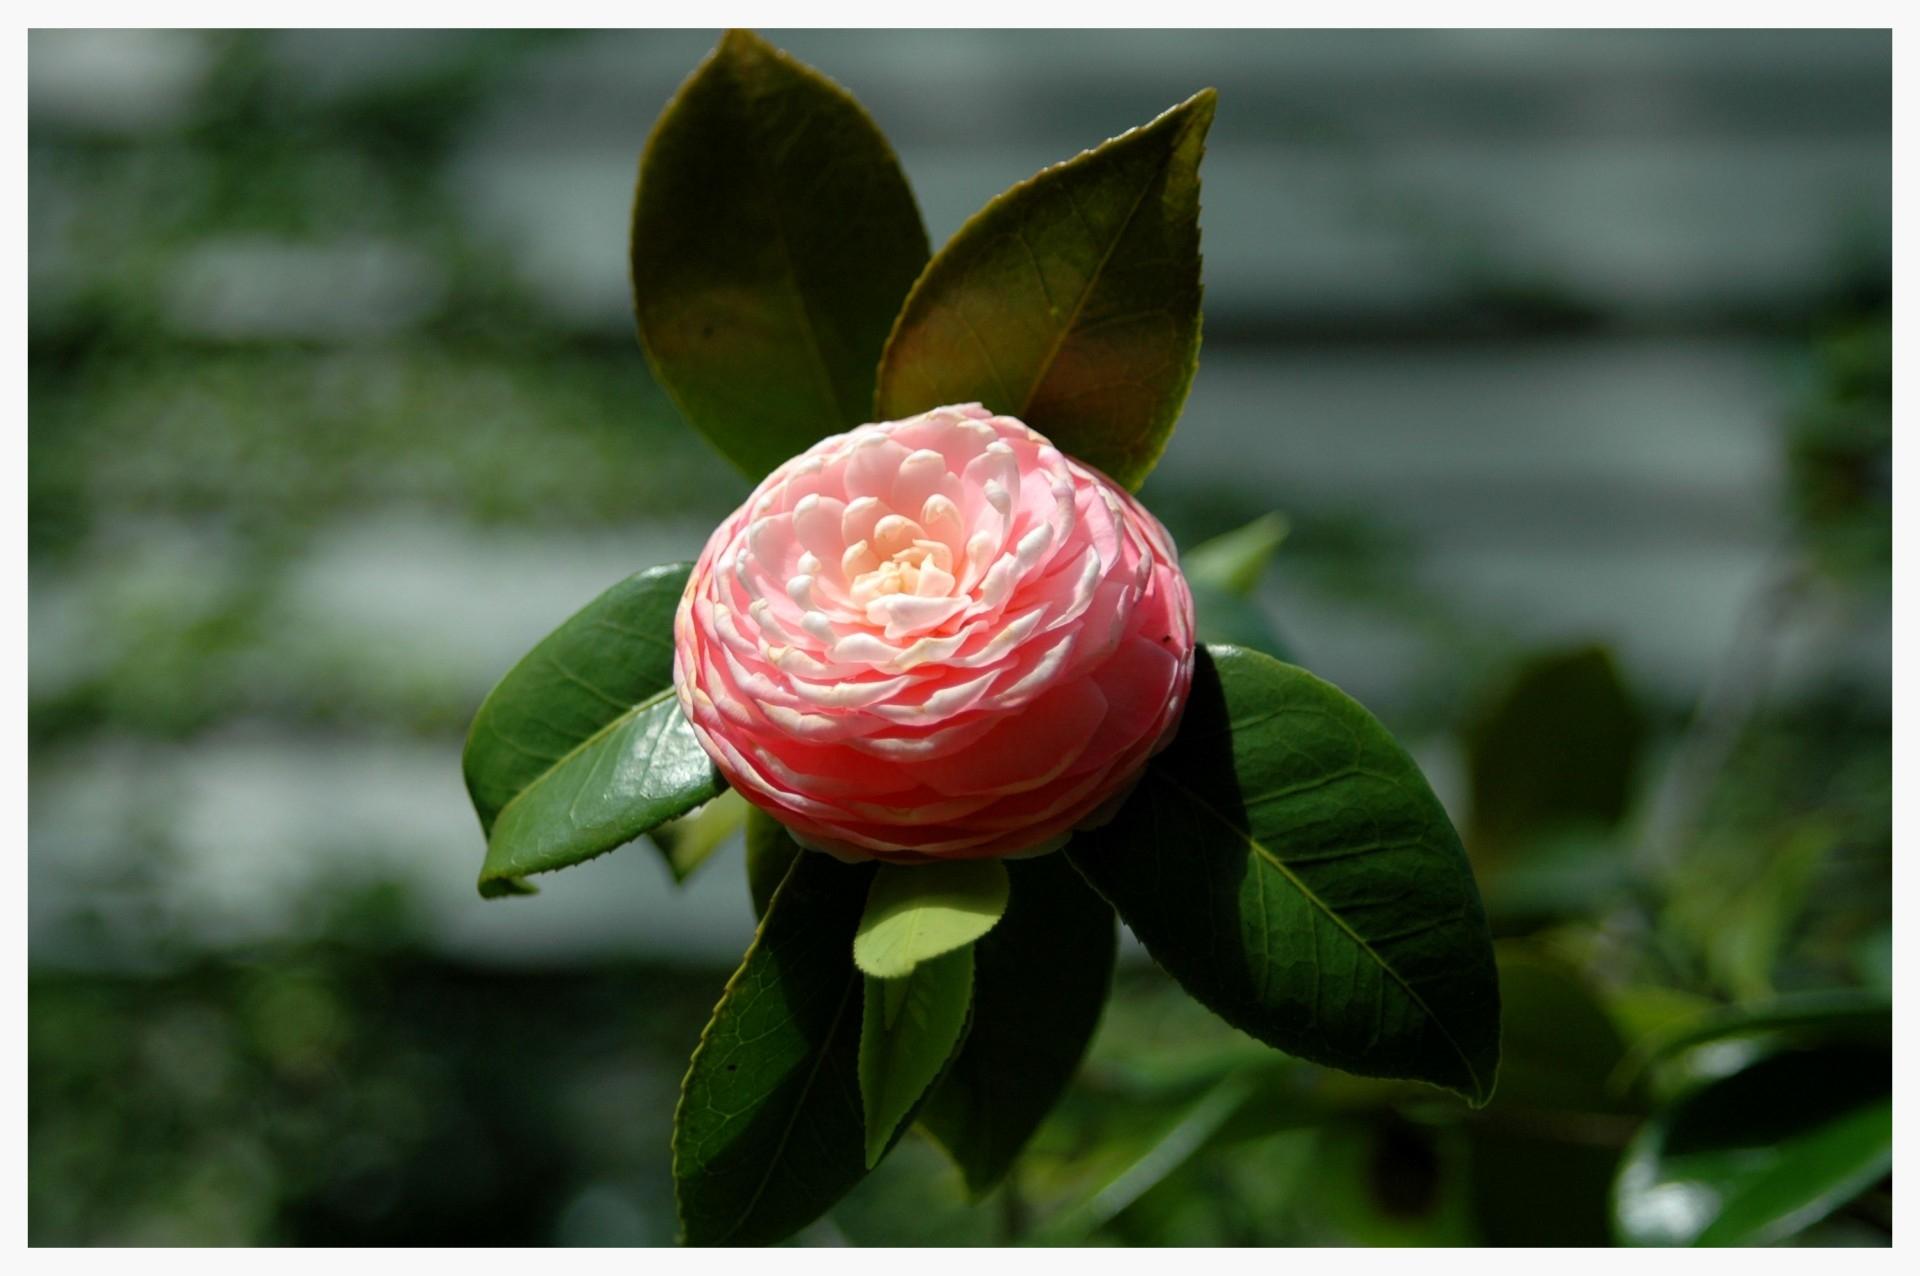 Camellia invades America, conquers Alabama (public domain photo)